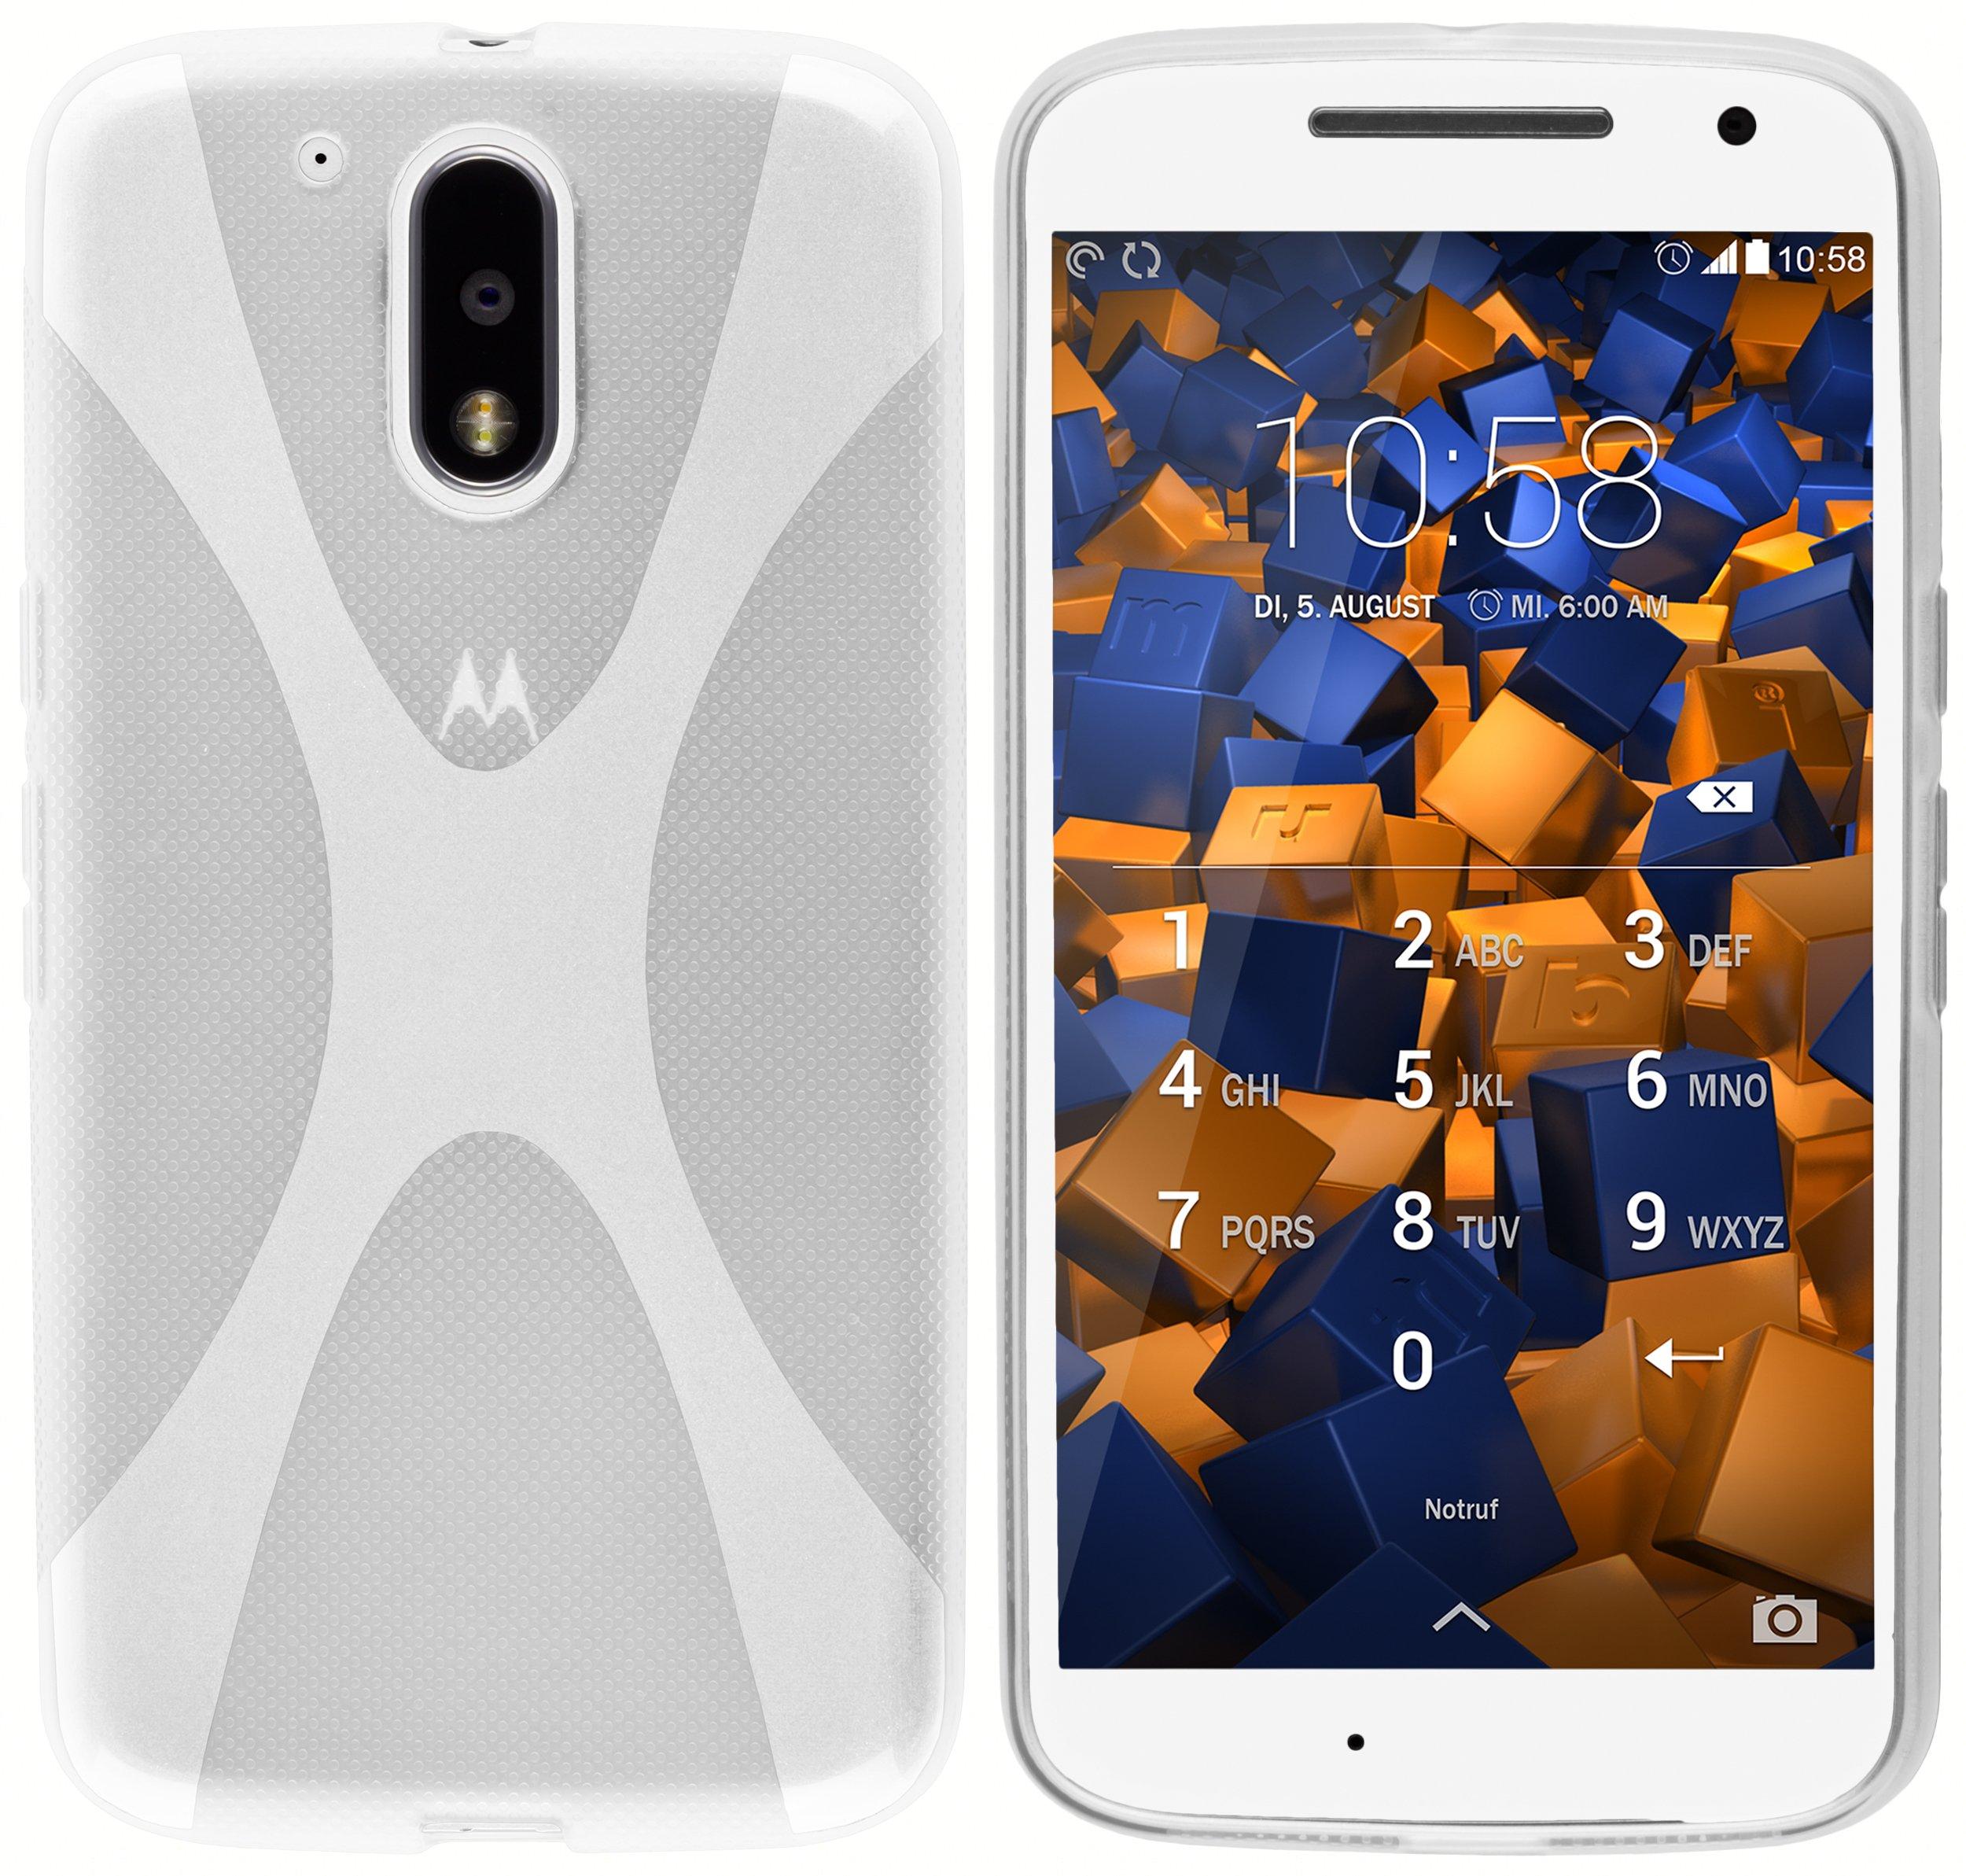 mumbi X-TPU Funda compatible con Motorola Moto G4/G4 Plus, blanco claro: Amazon.es: Electrónica